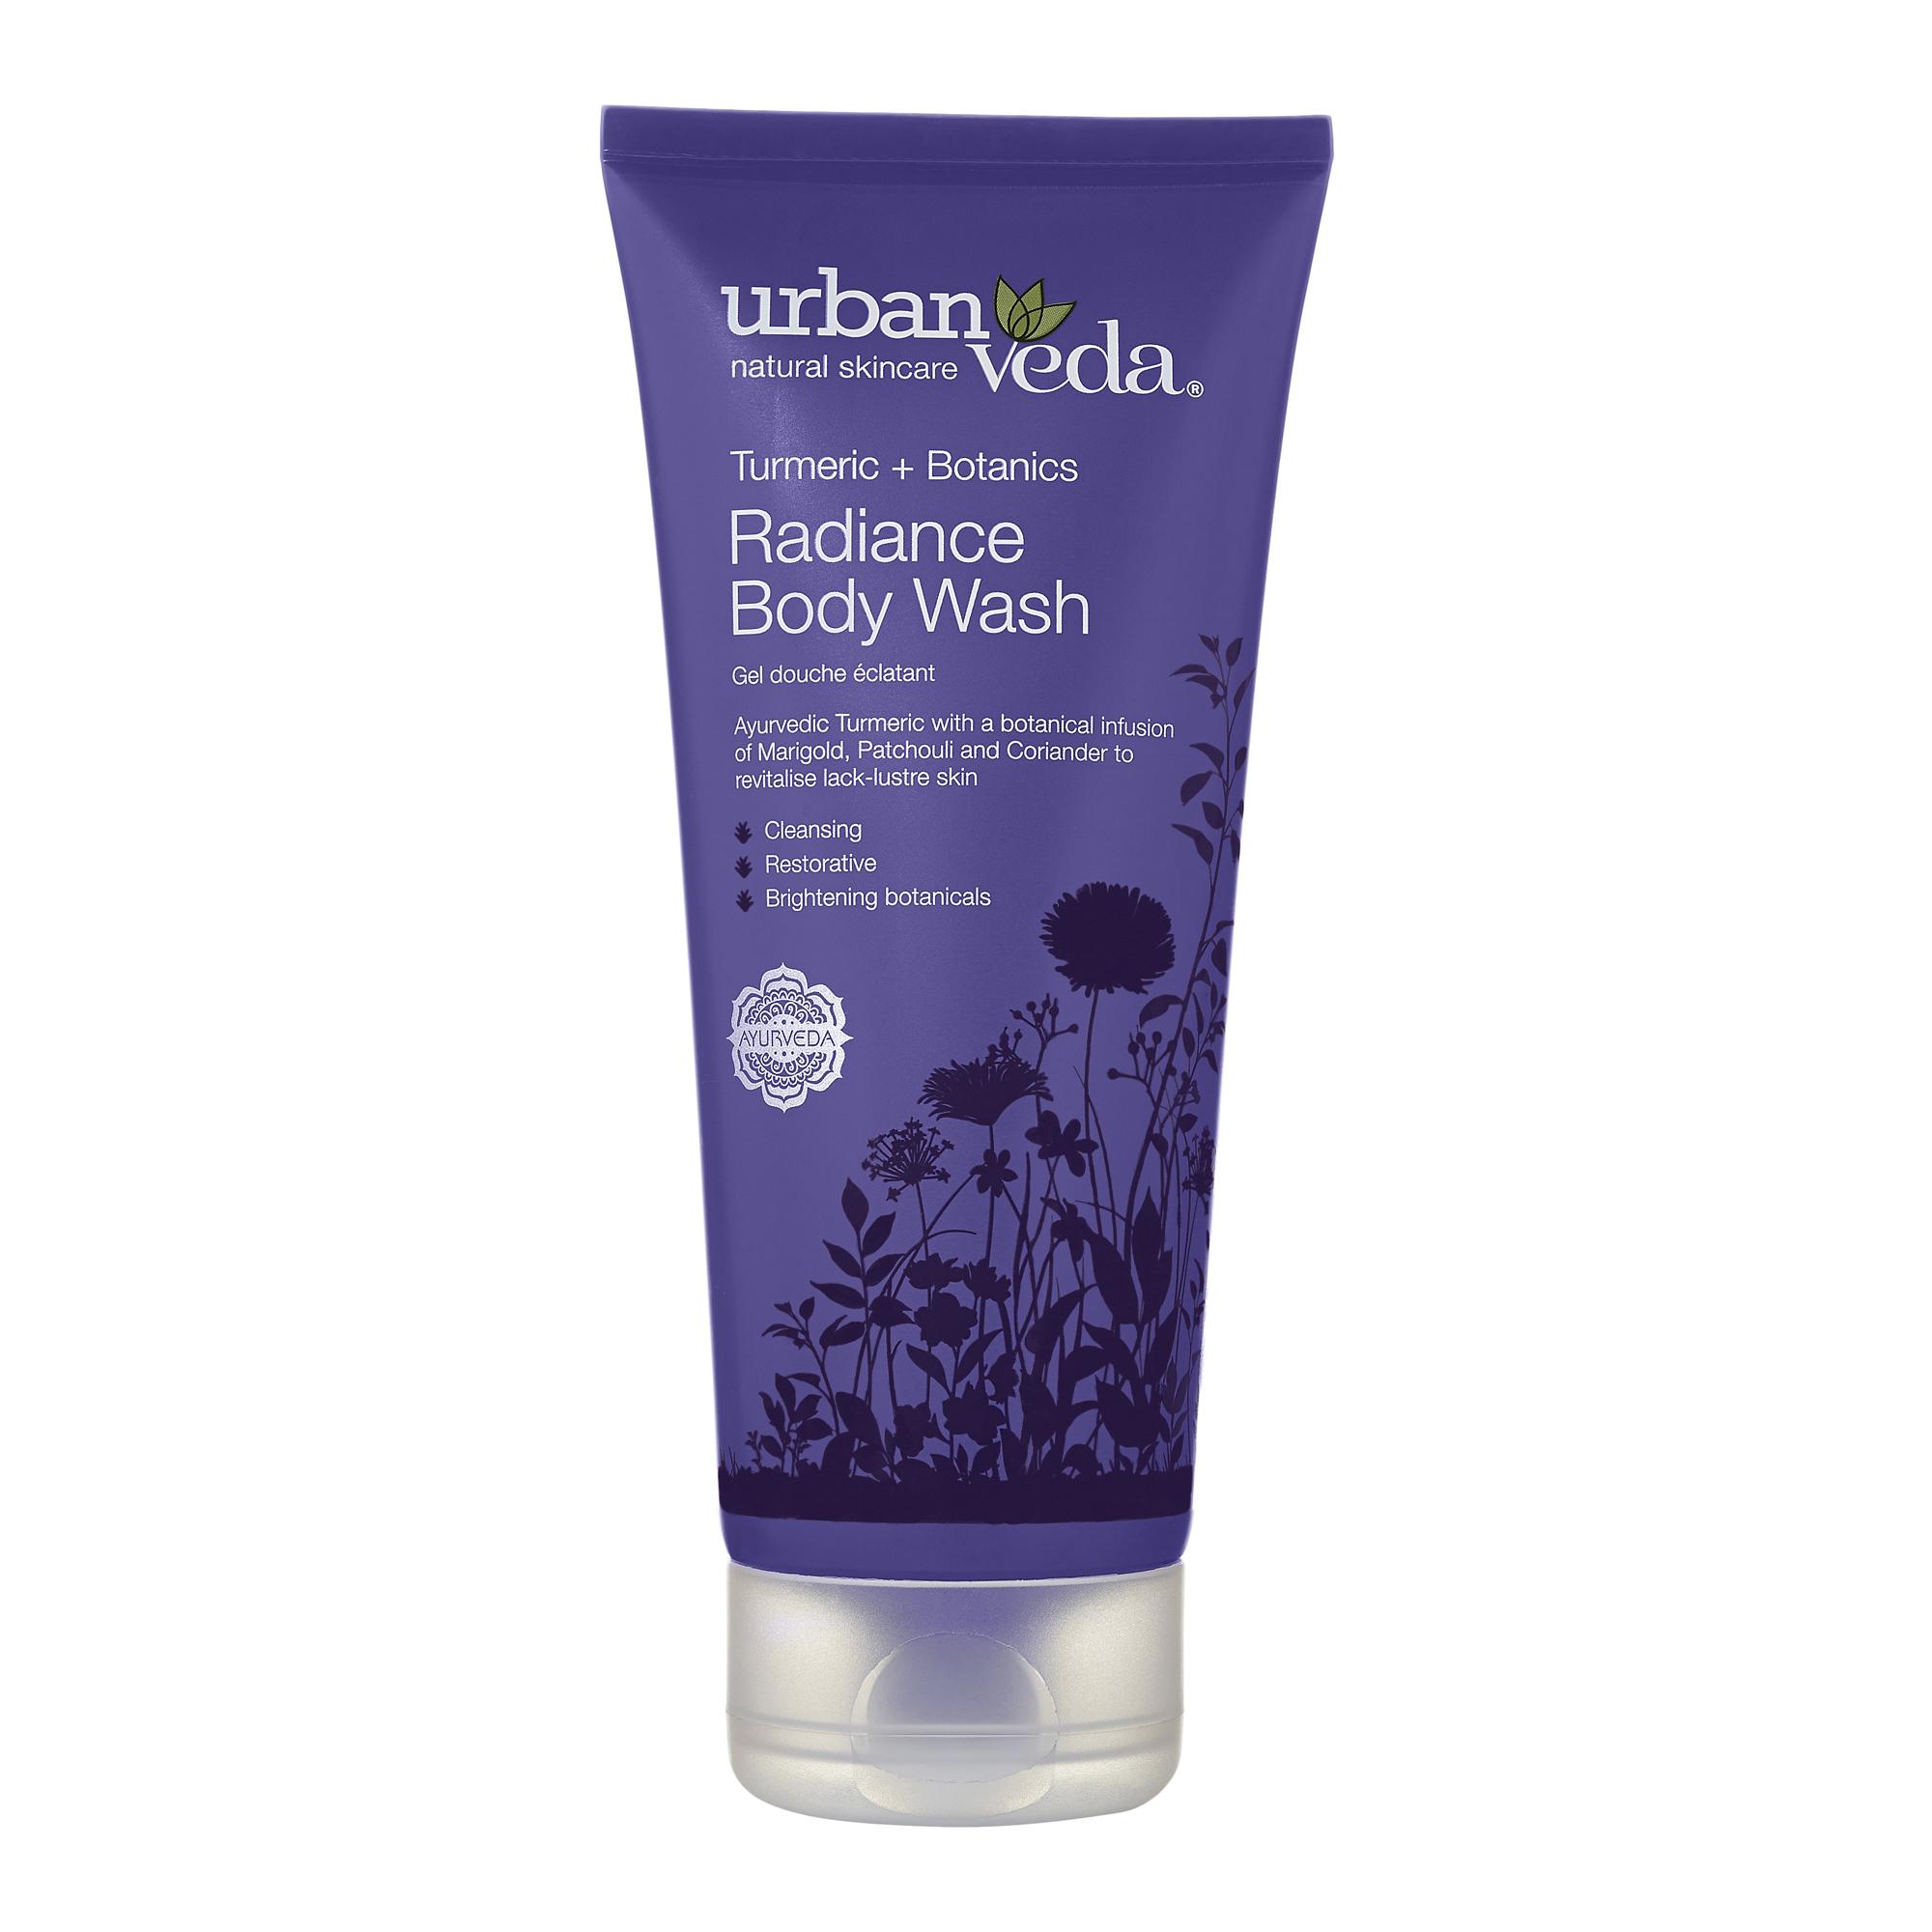 Urban Veda | Urban Veda Radiance Turmeric Body Wash, 200ml